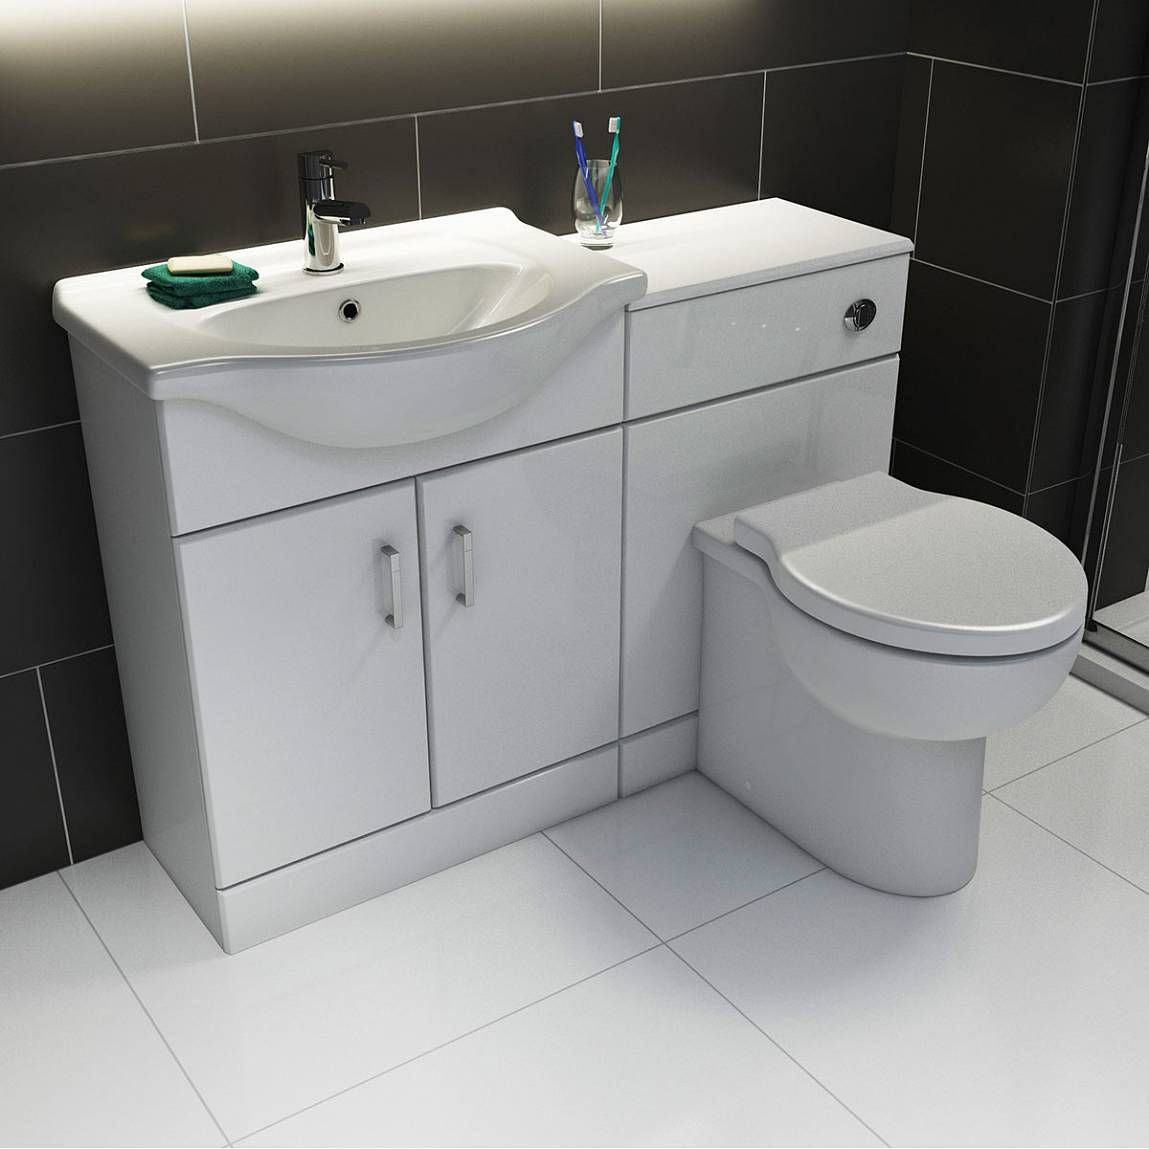 Sienna White 55 Vanity Unit Basin Victoria Plumb White Bathroom Furniture Bathroom Furniture Bathroom